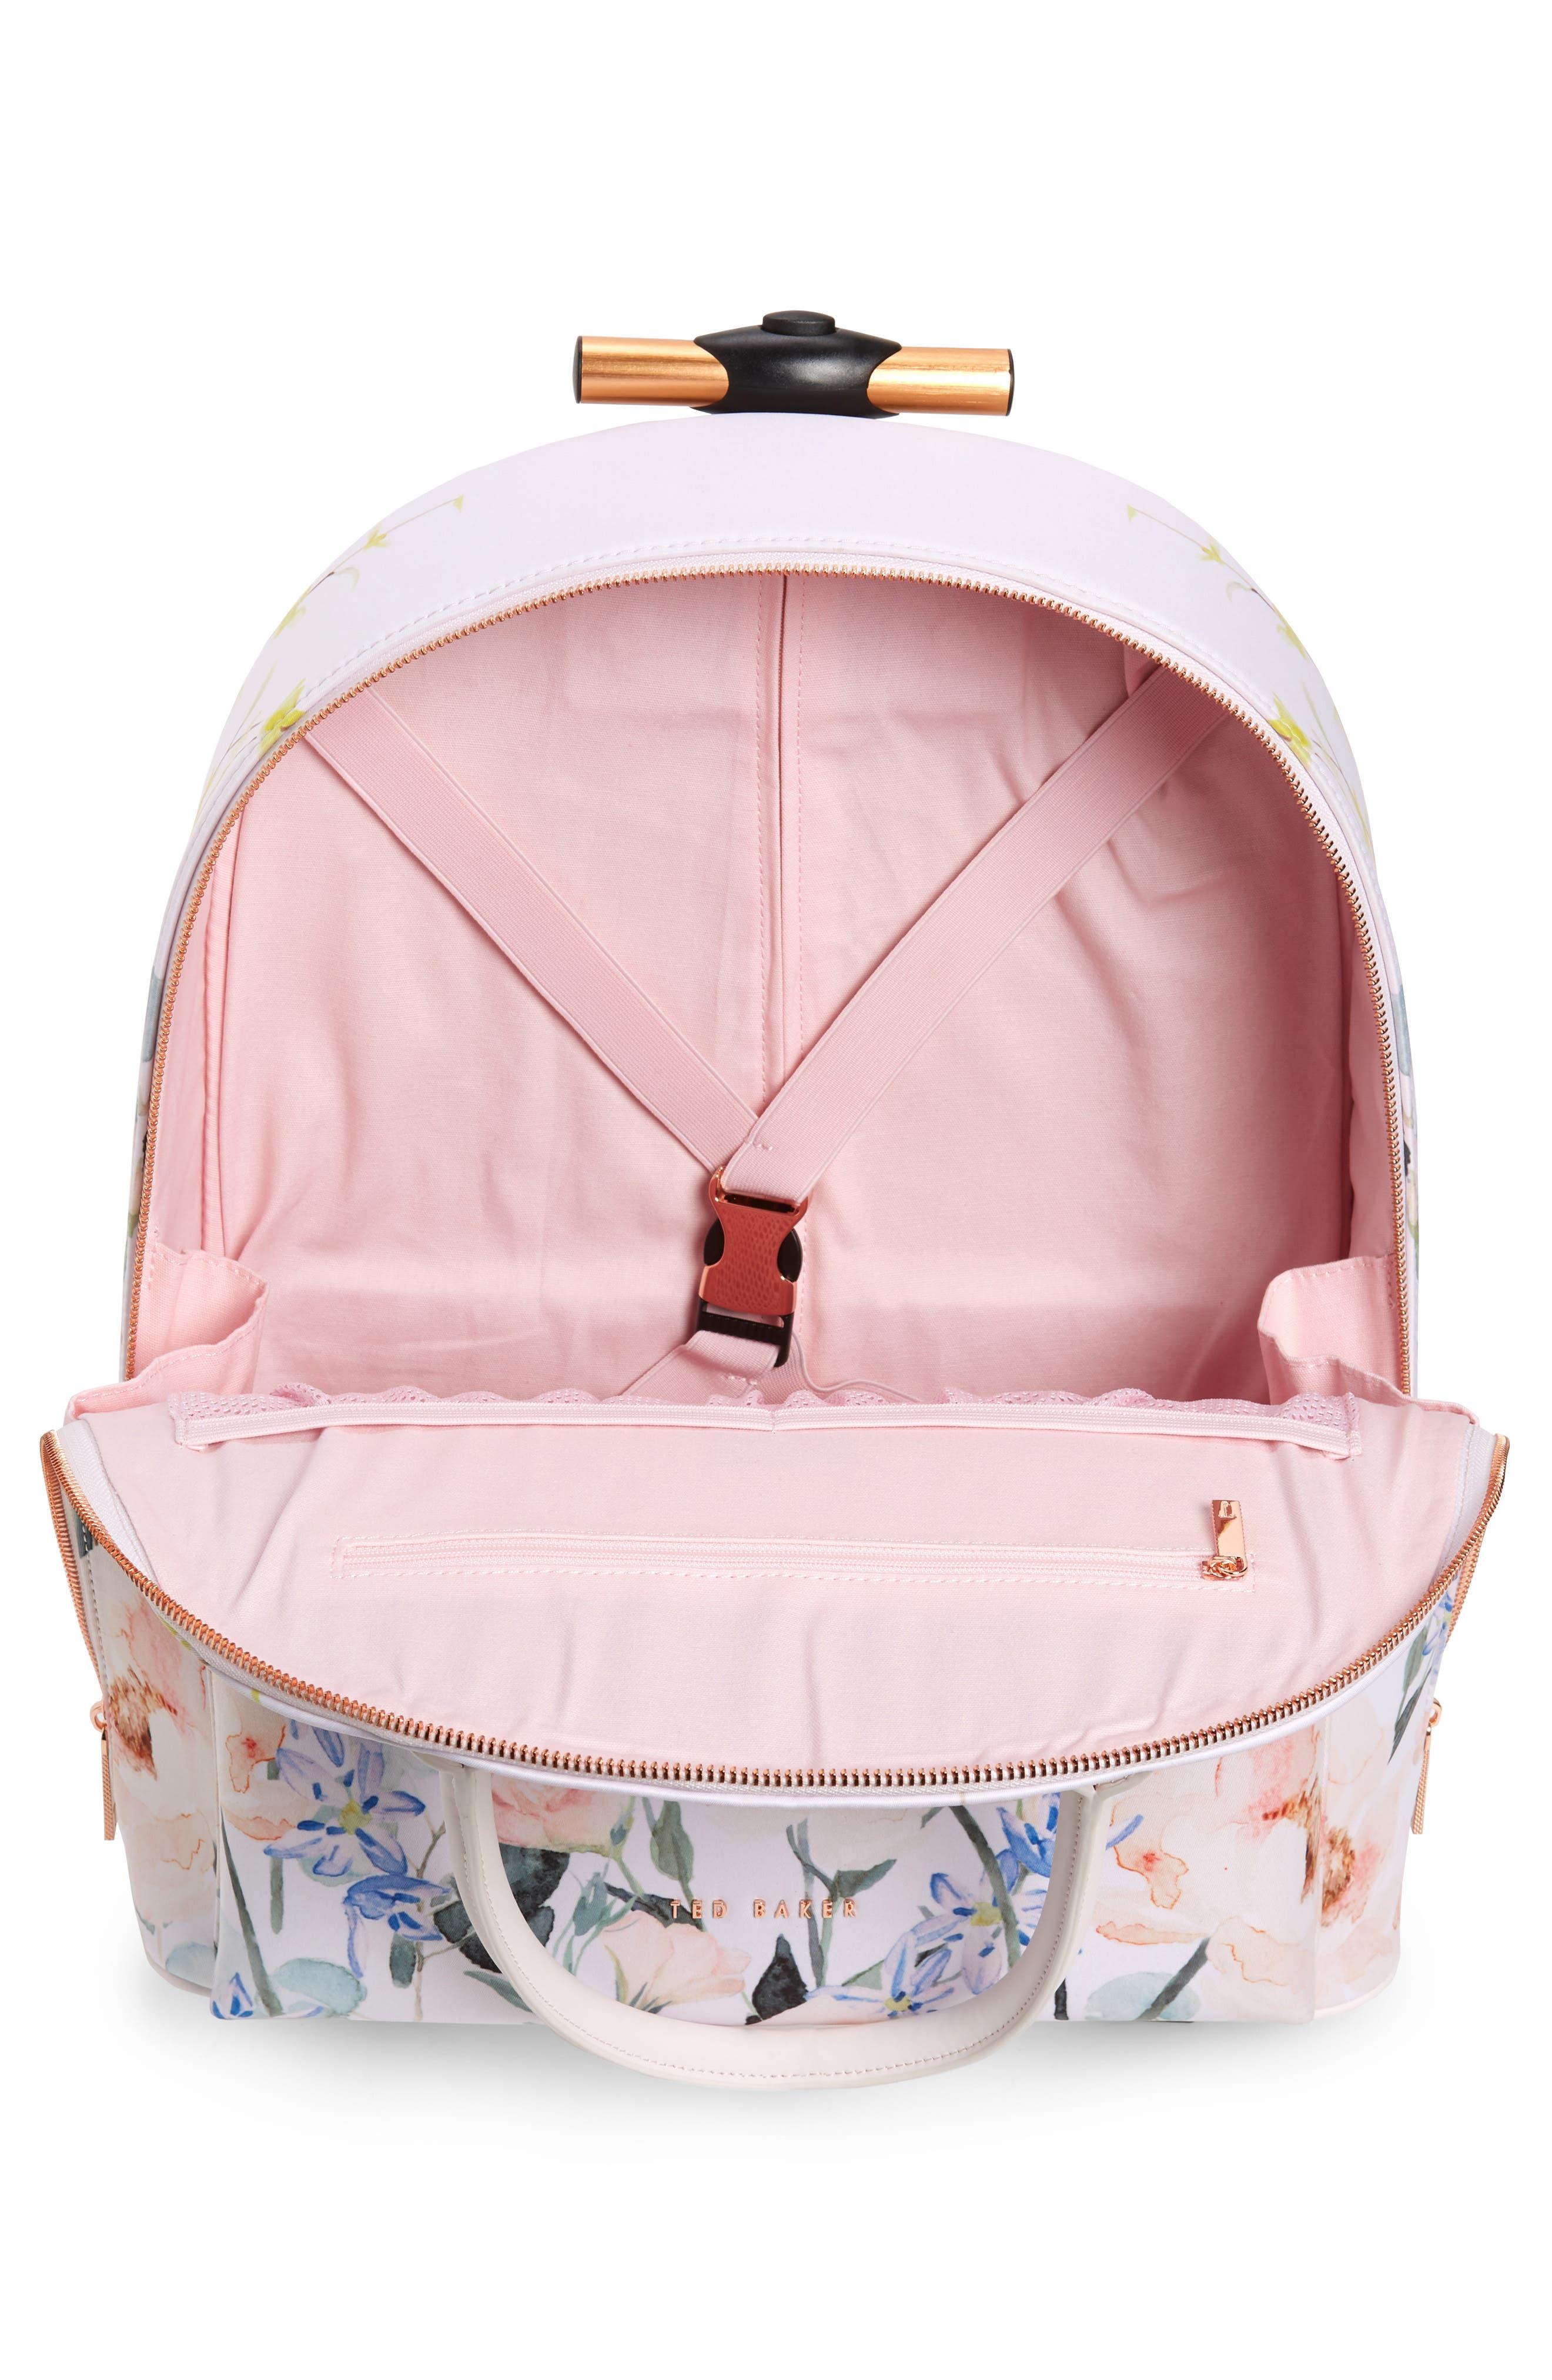 TED BAKER LONDON, Elianna Elegant Travel Bag, Alternate thumbnail 2, color, NUDE PINK